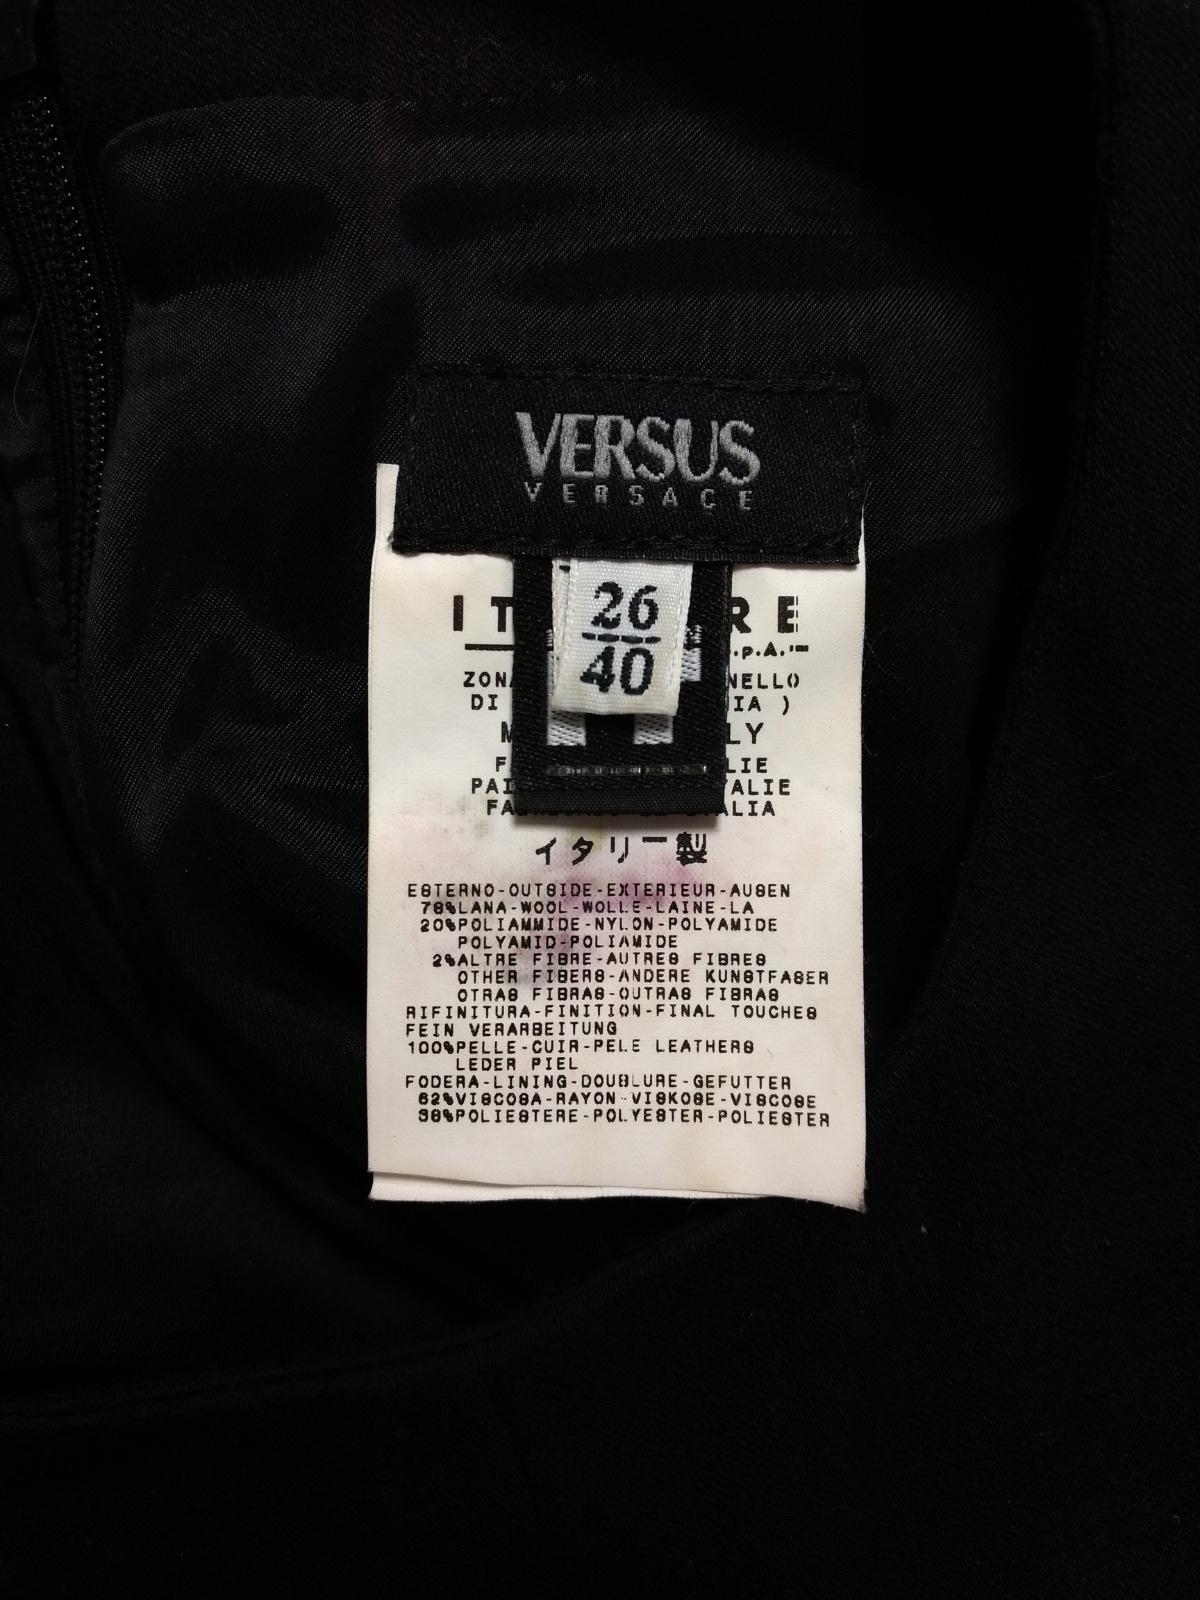 VERSUS(ヴェルサス)のワンピース